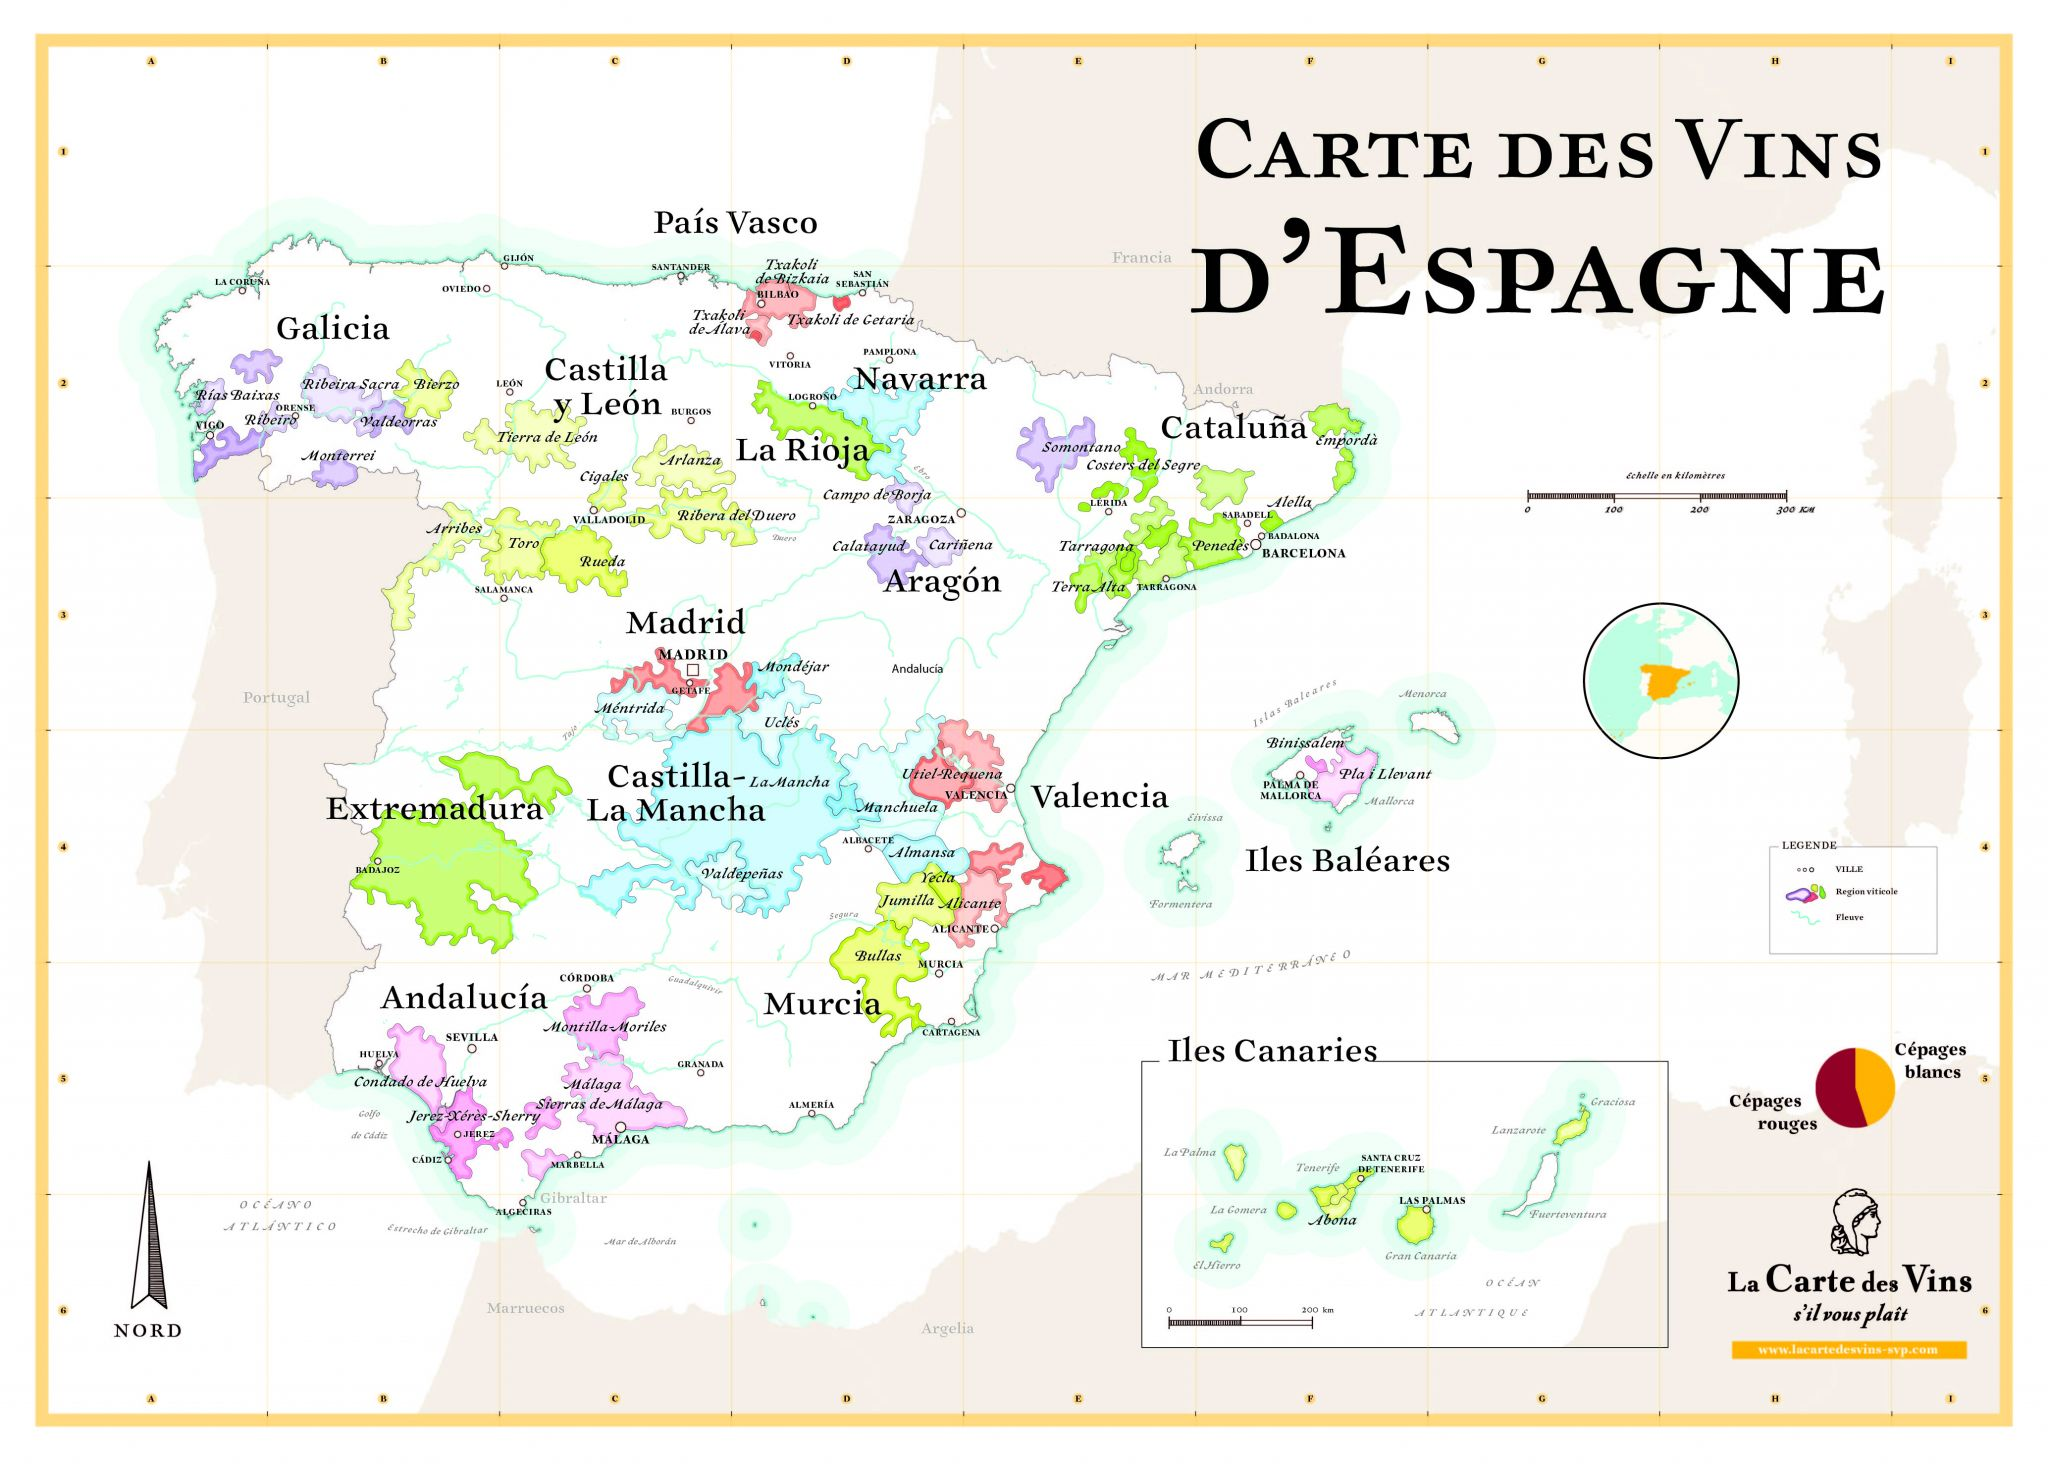 carte-vins-espagne-spain-wine-map